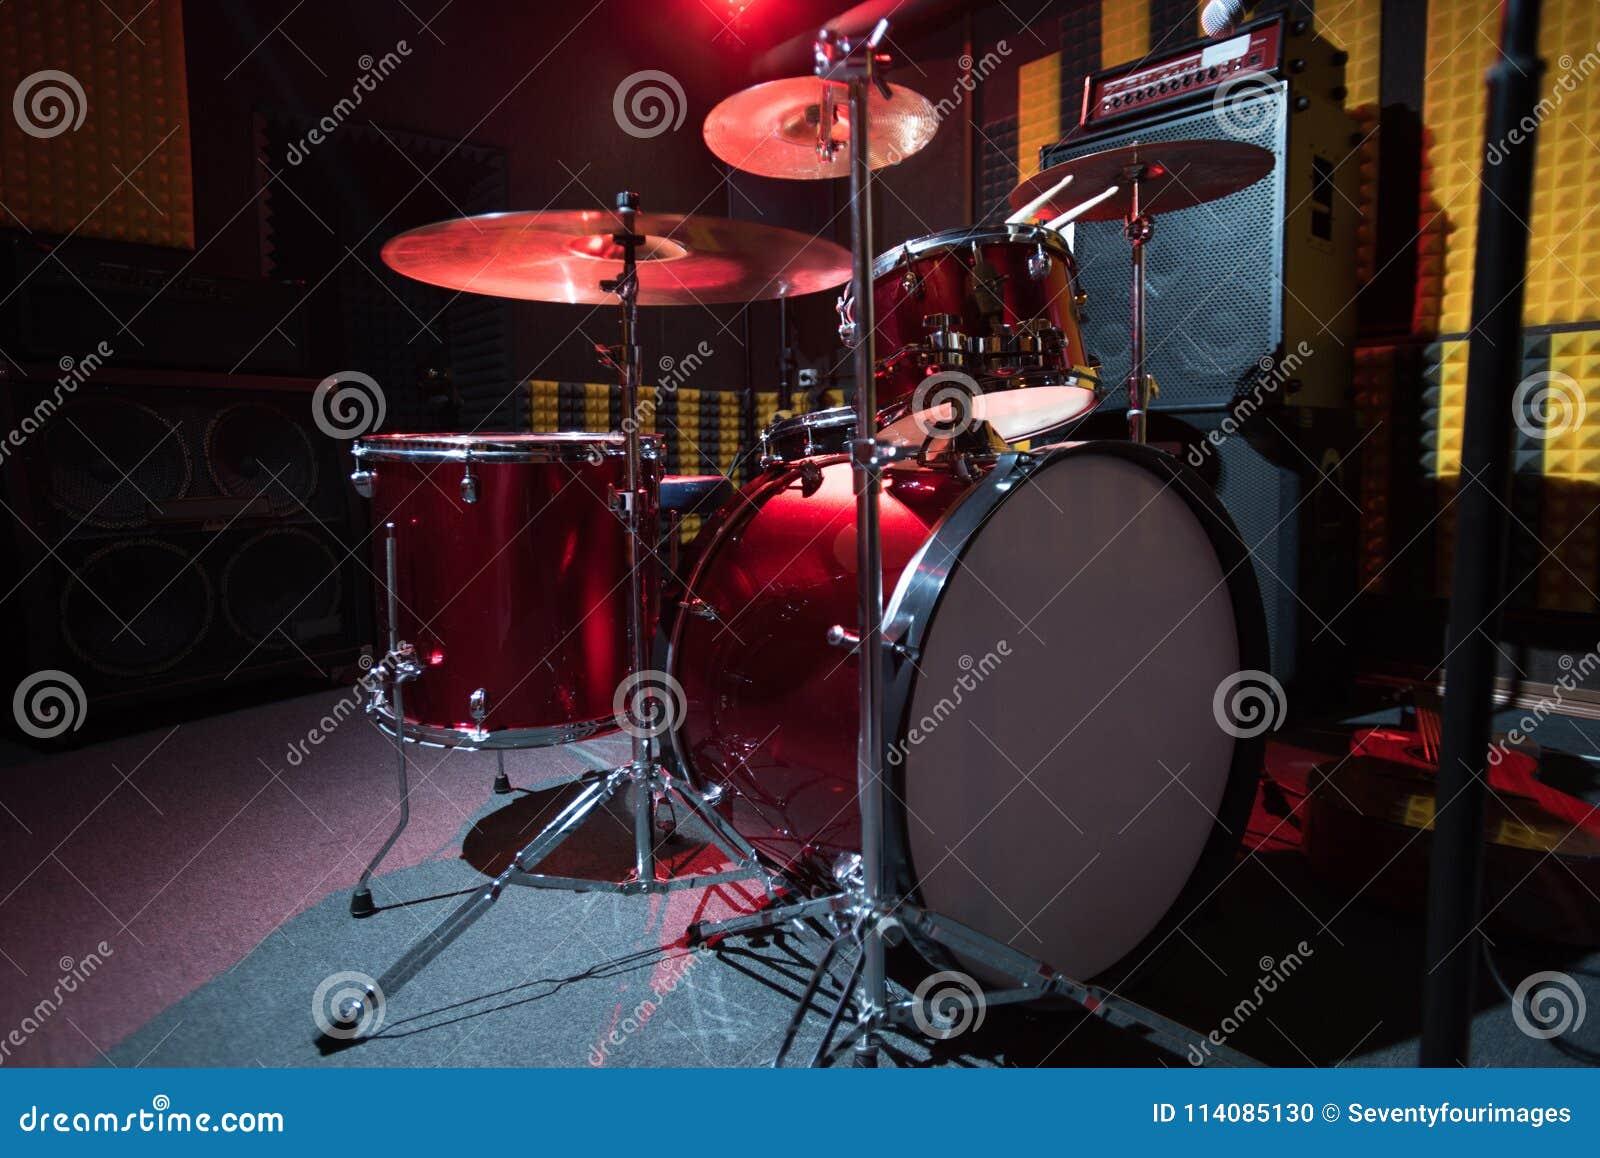 Modern Drum Set On Stage Stock Photo Image Of Garage 114085130